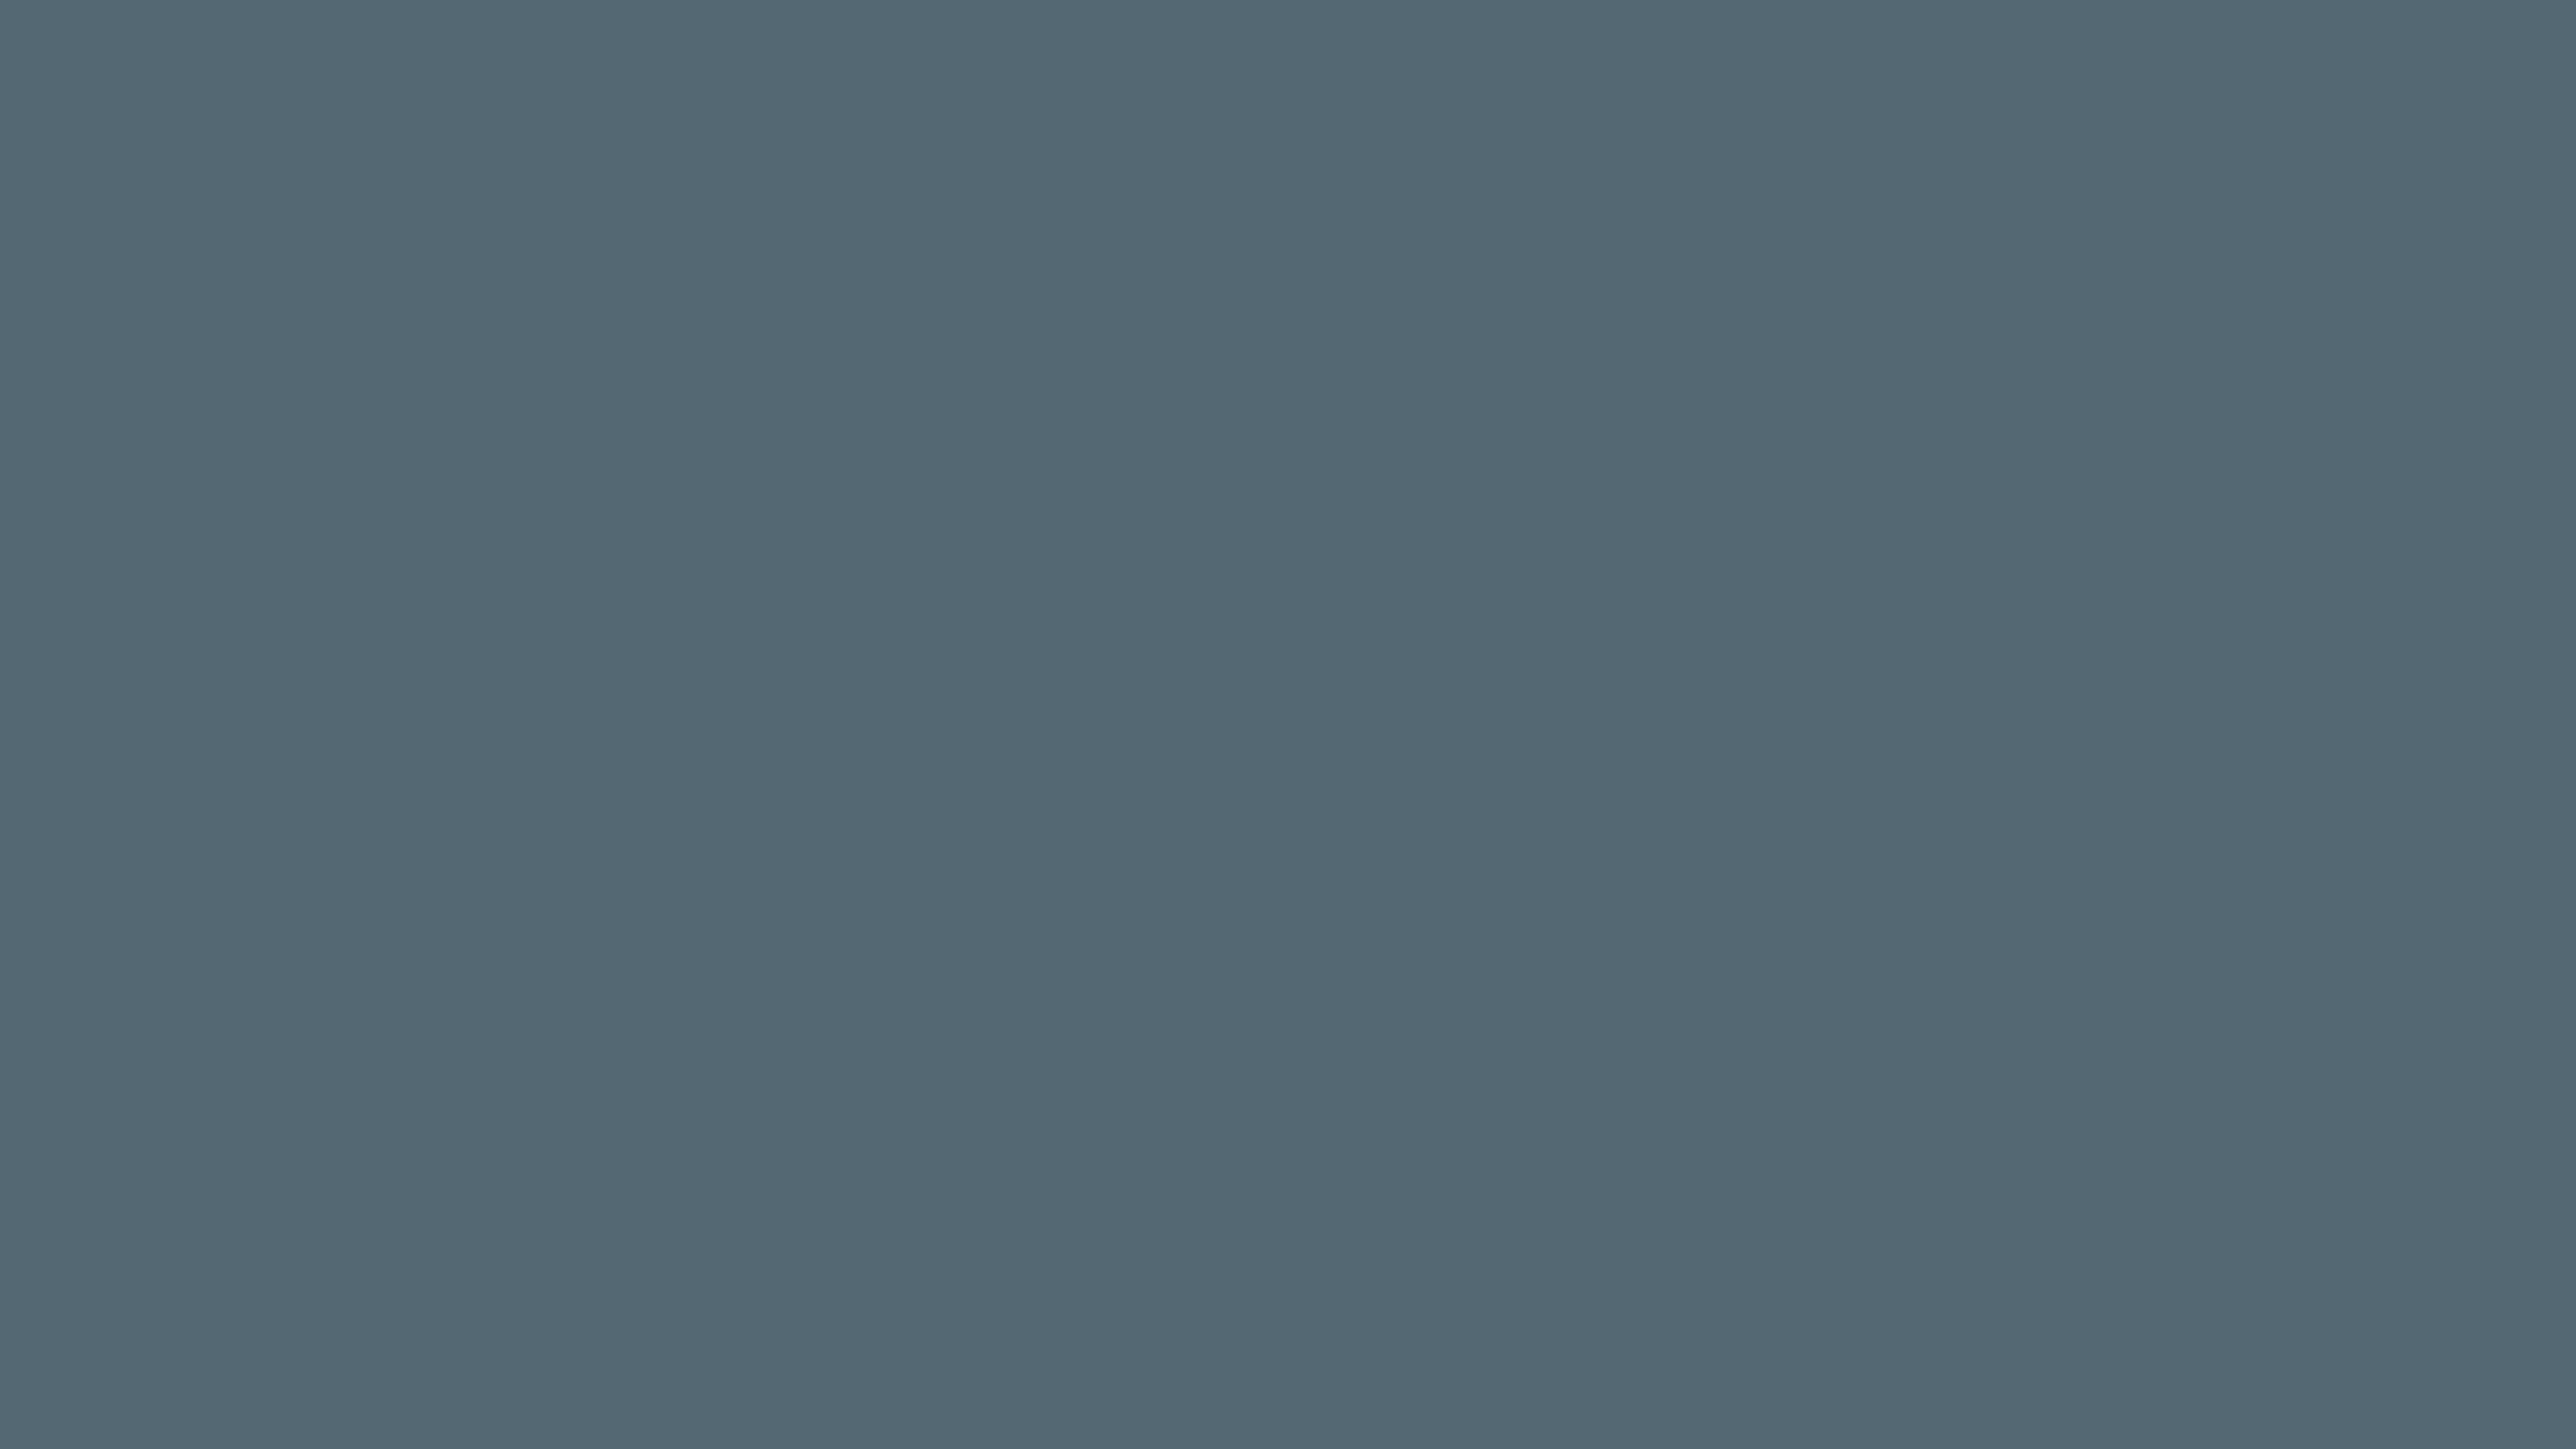 4096x2304 Cadet Solid Color Background